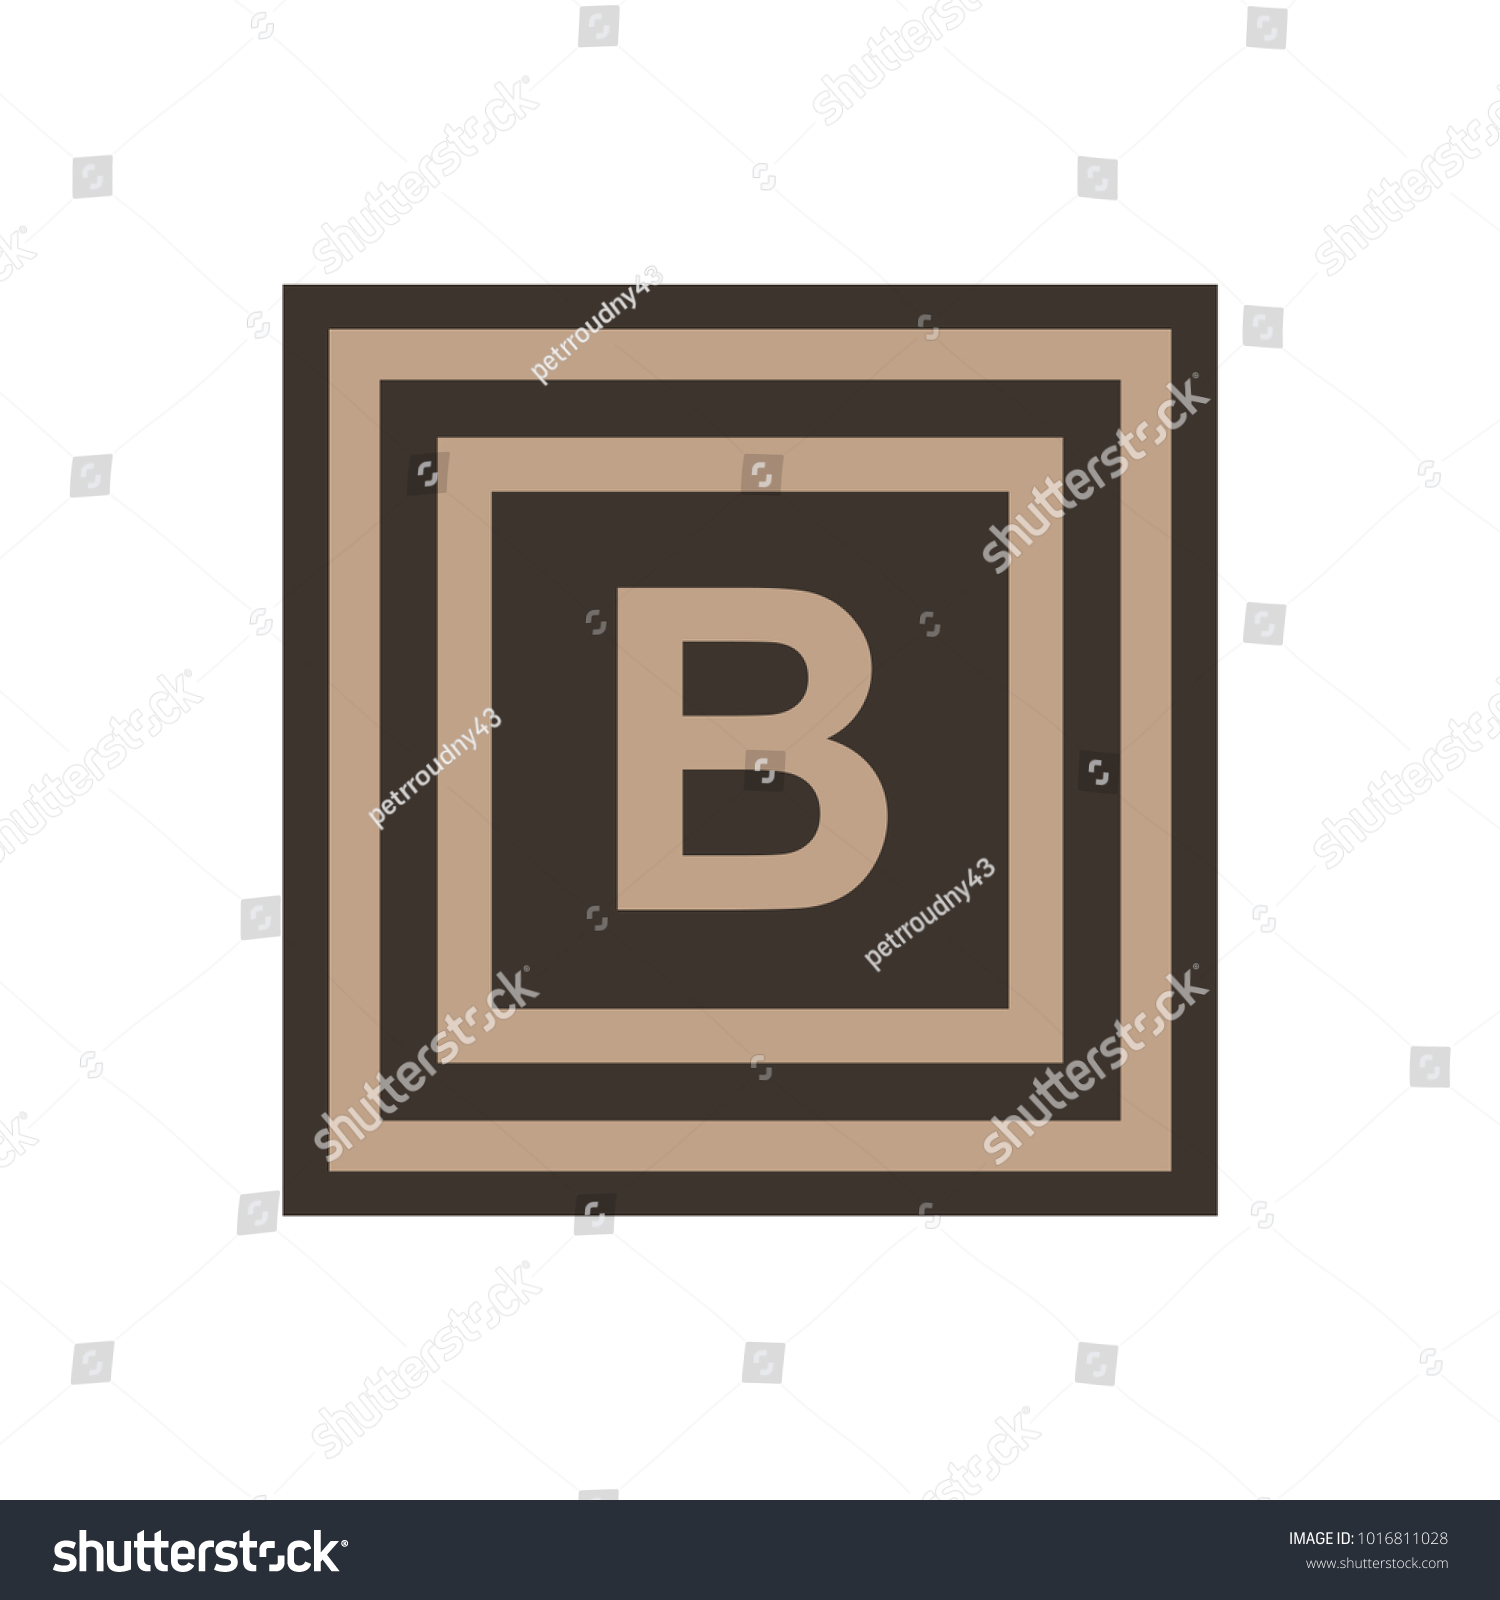 Vector symbol letter beta b greek stock vector 1016811028 vector symbol of letter beta or b from the greek alphabet biocorpaavc Gallery